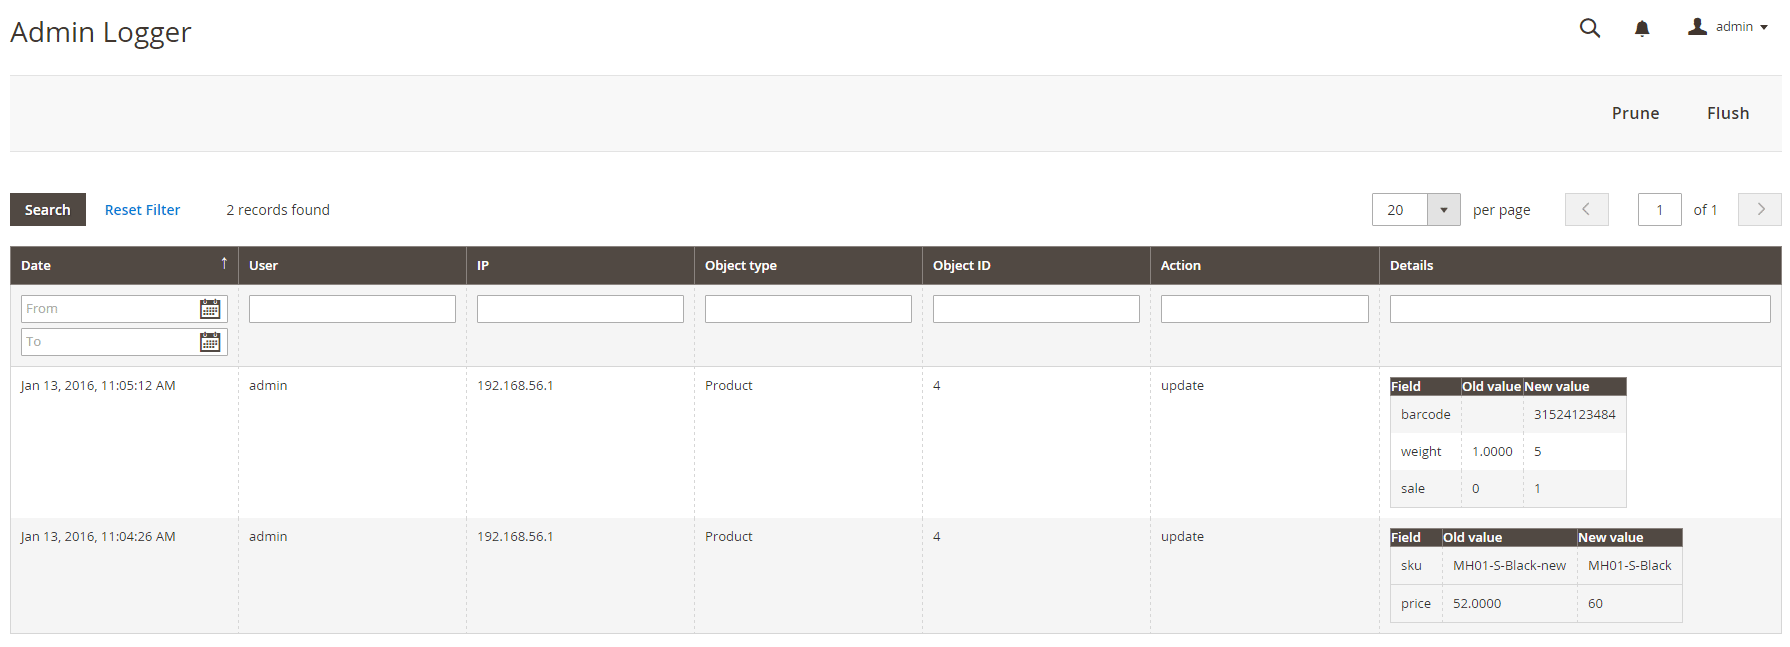 admin logger product magento 2